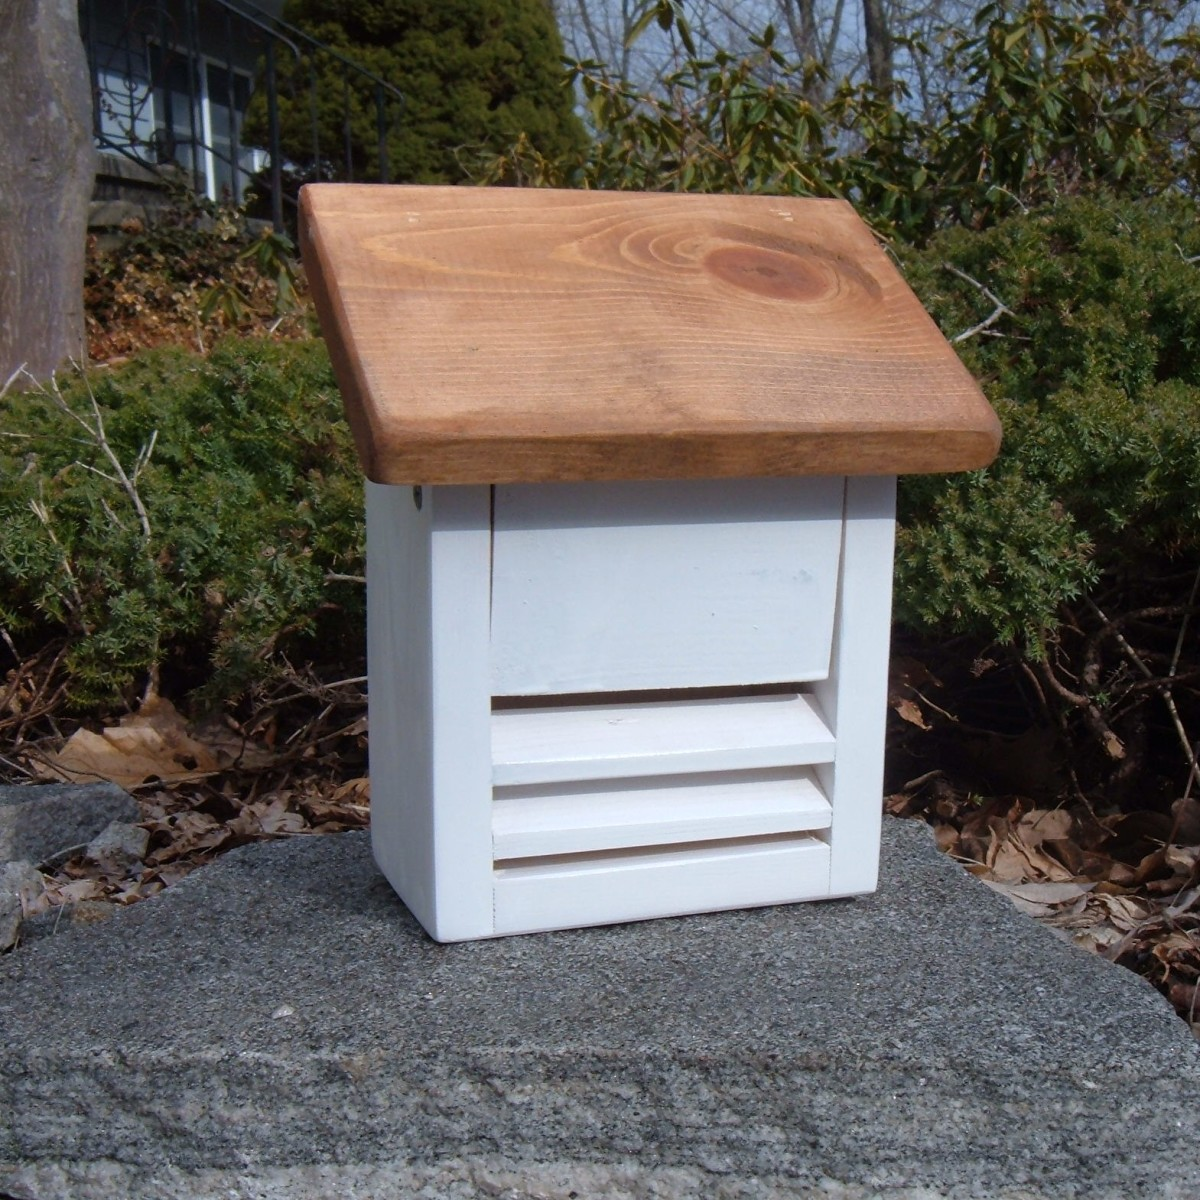 Ladybug House for the Garden